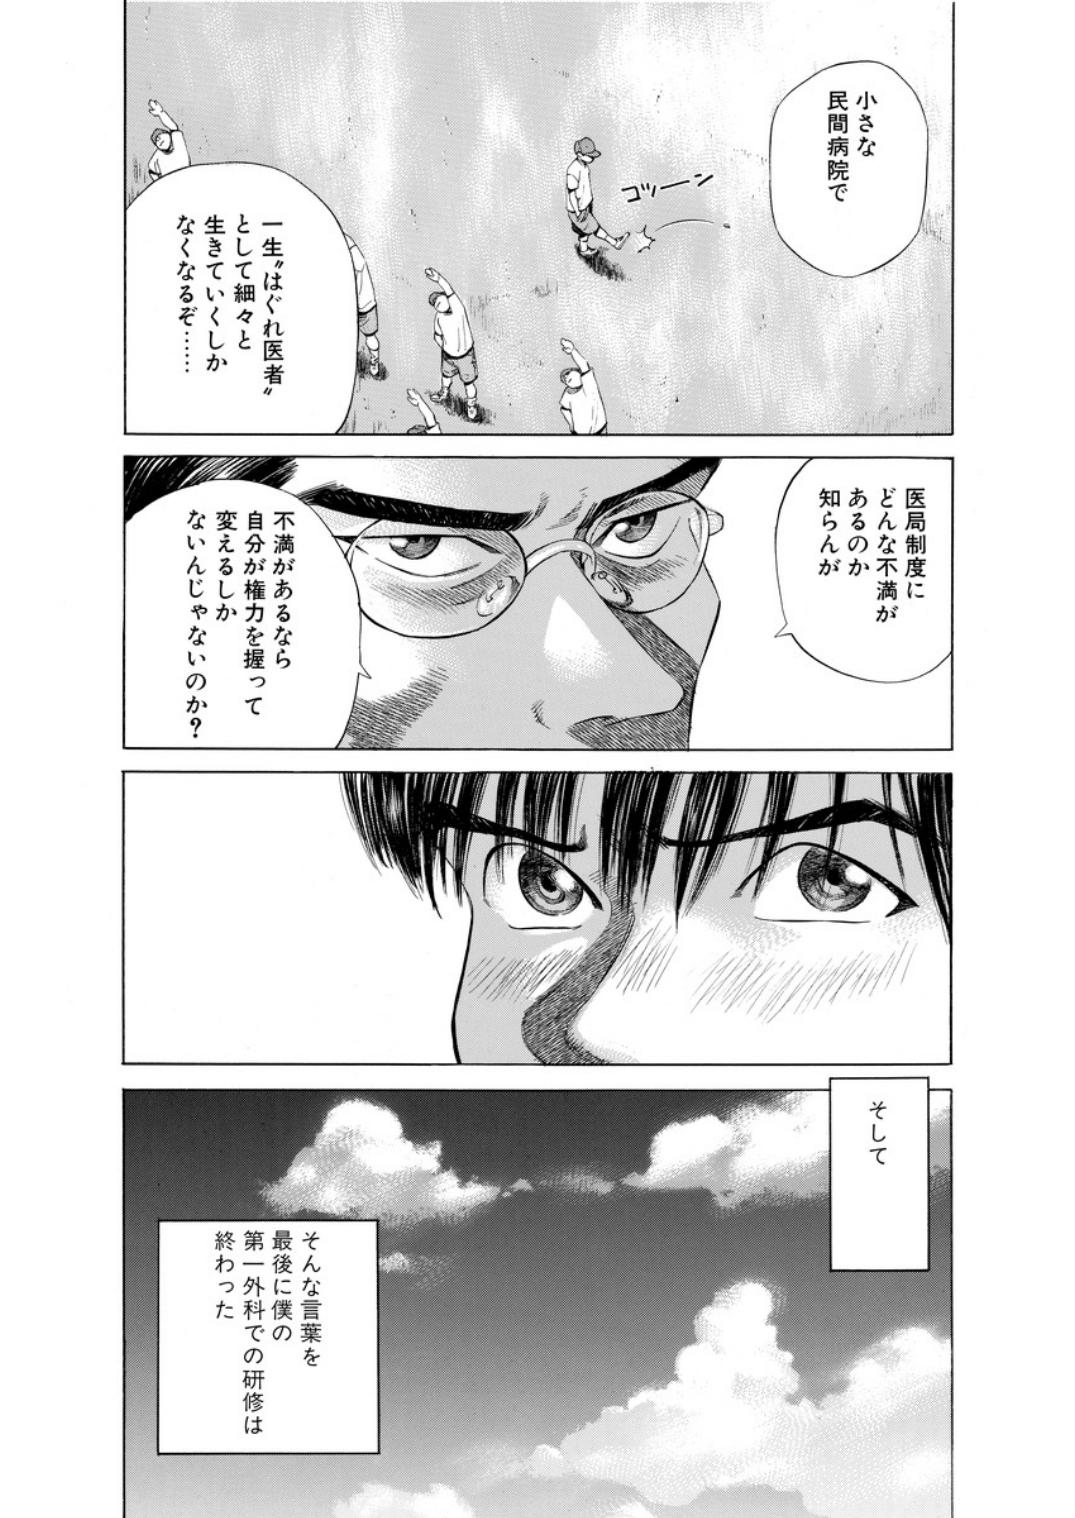 001bj_page-0161.jpg